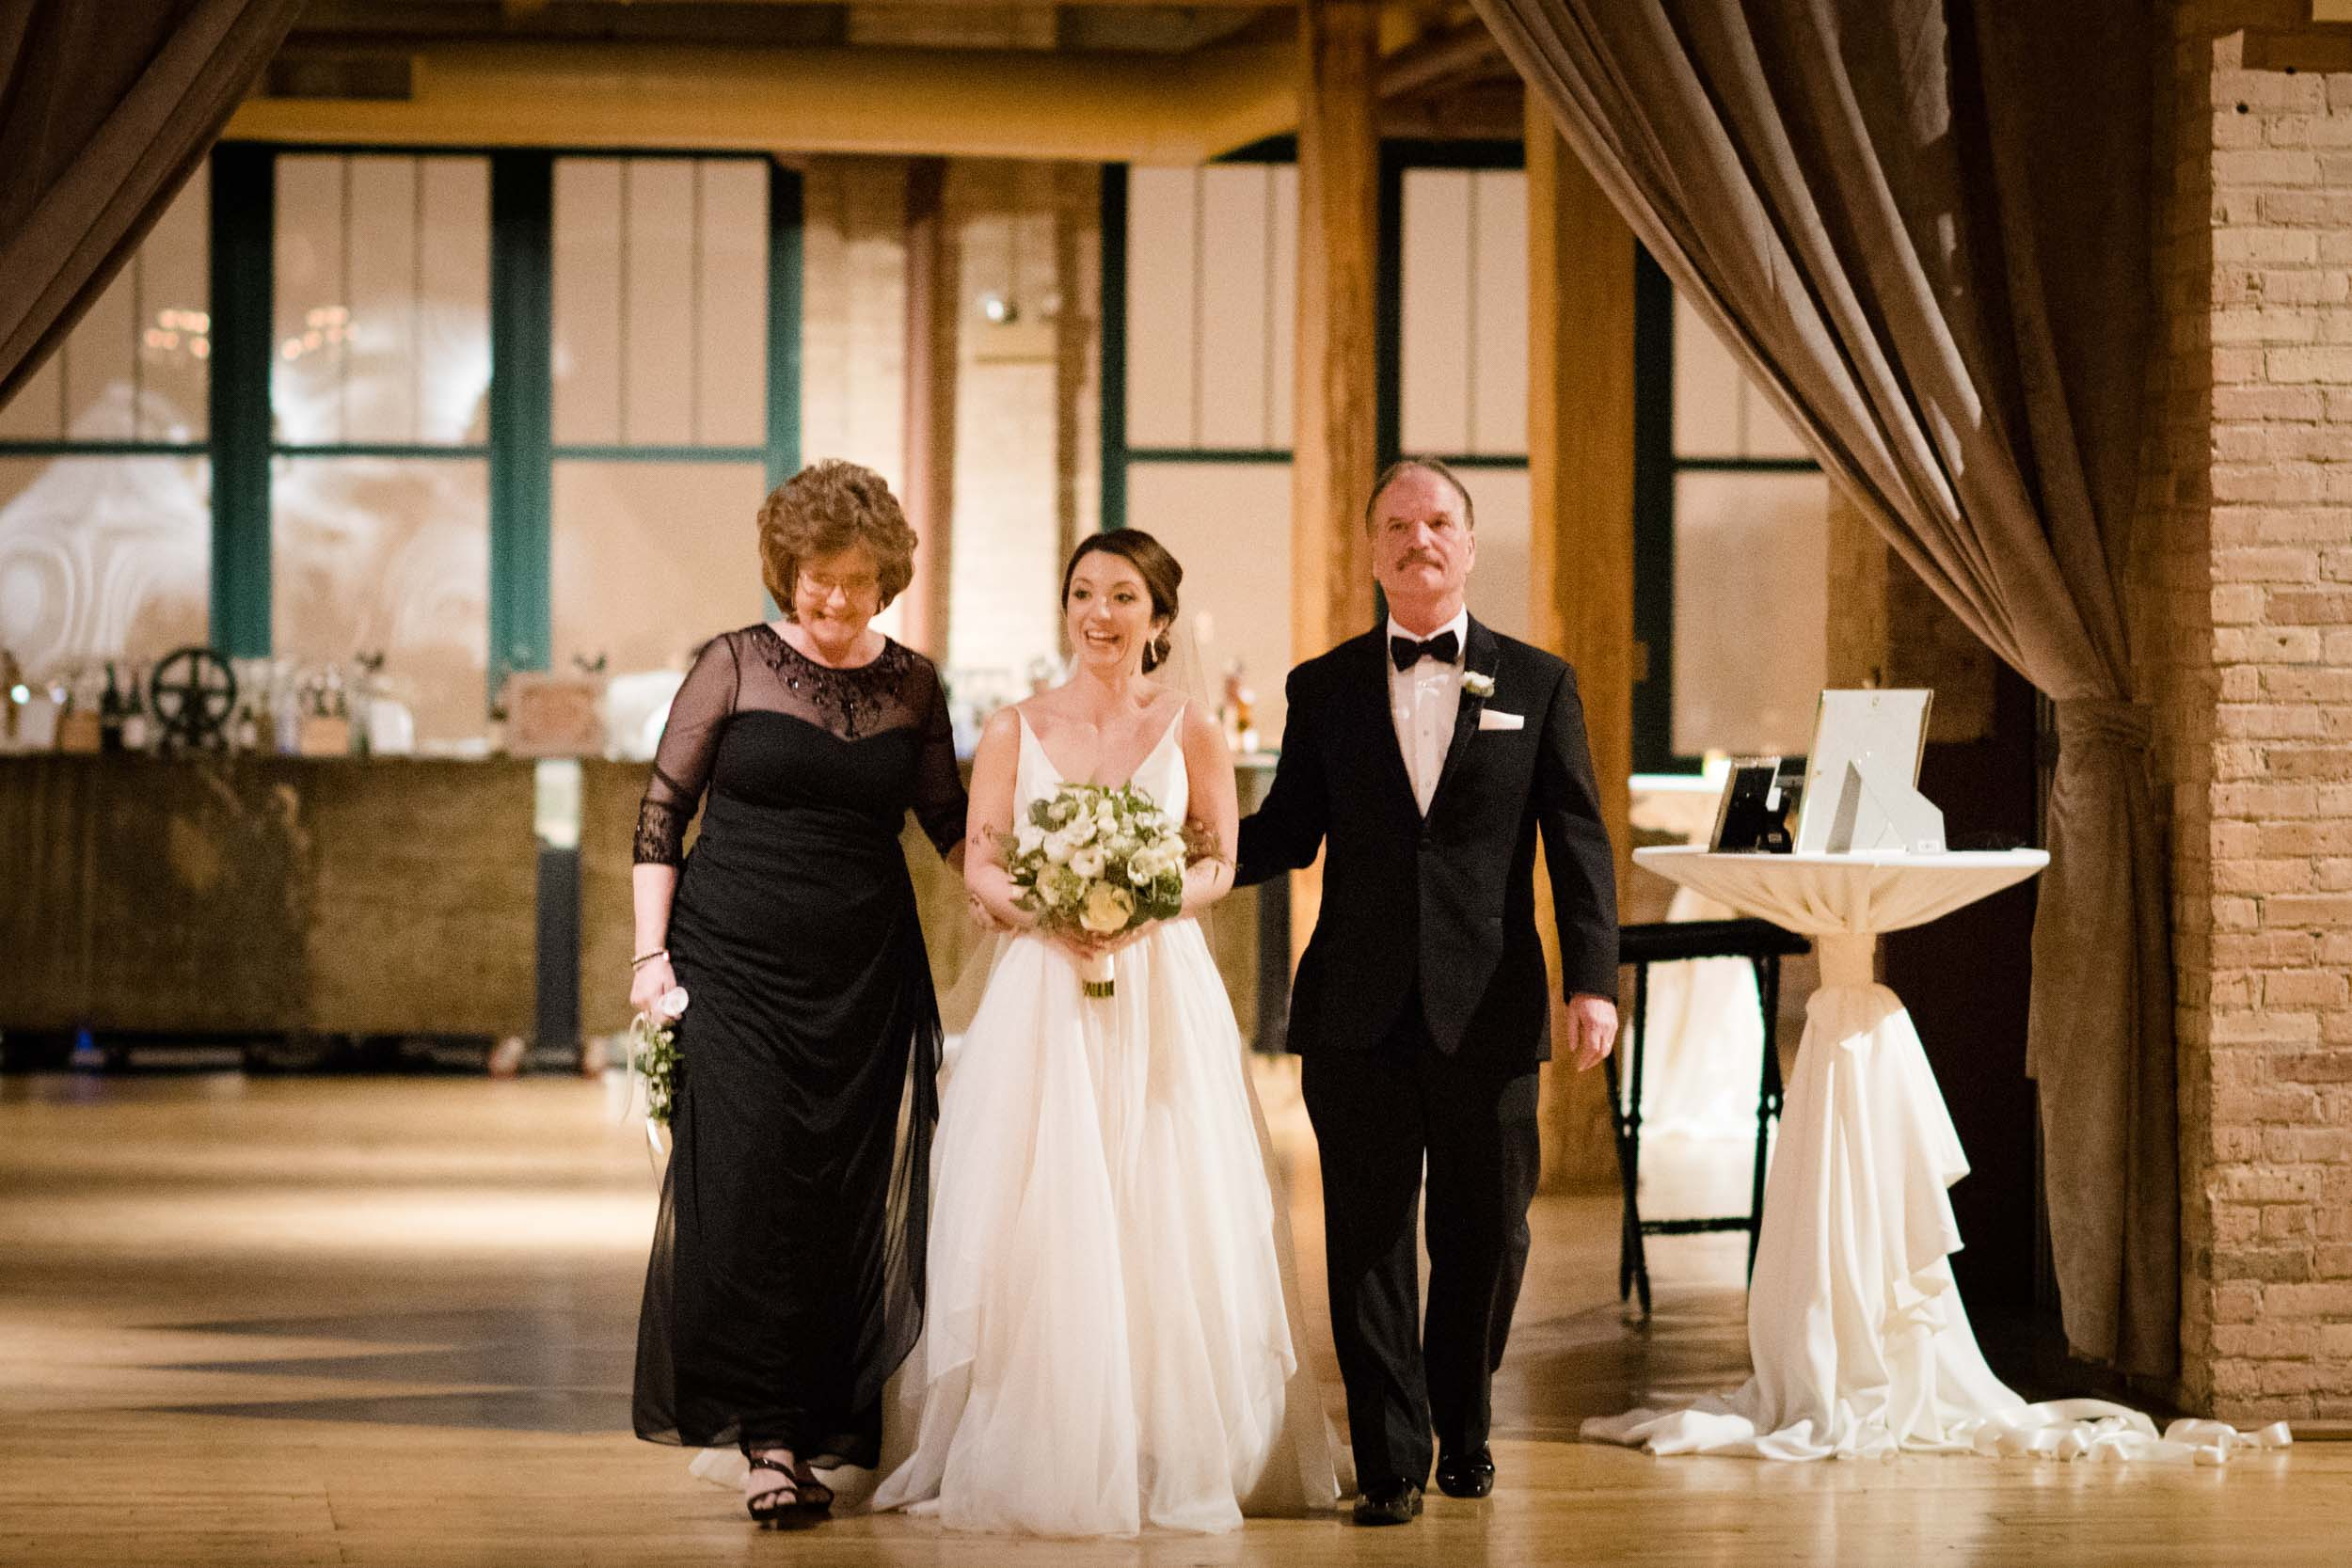 Bride and parents enter wedding ceremony at Bridgeport Art Center